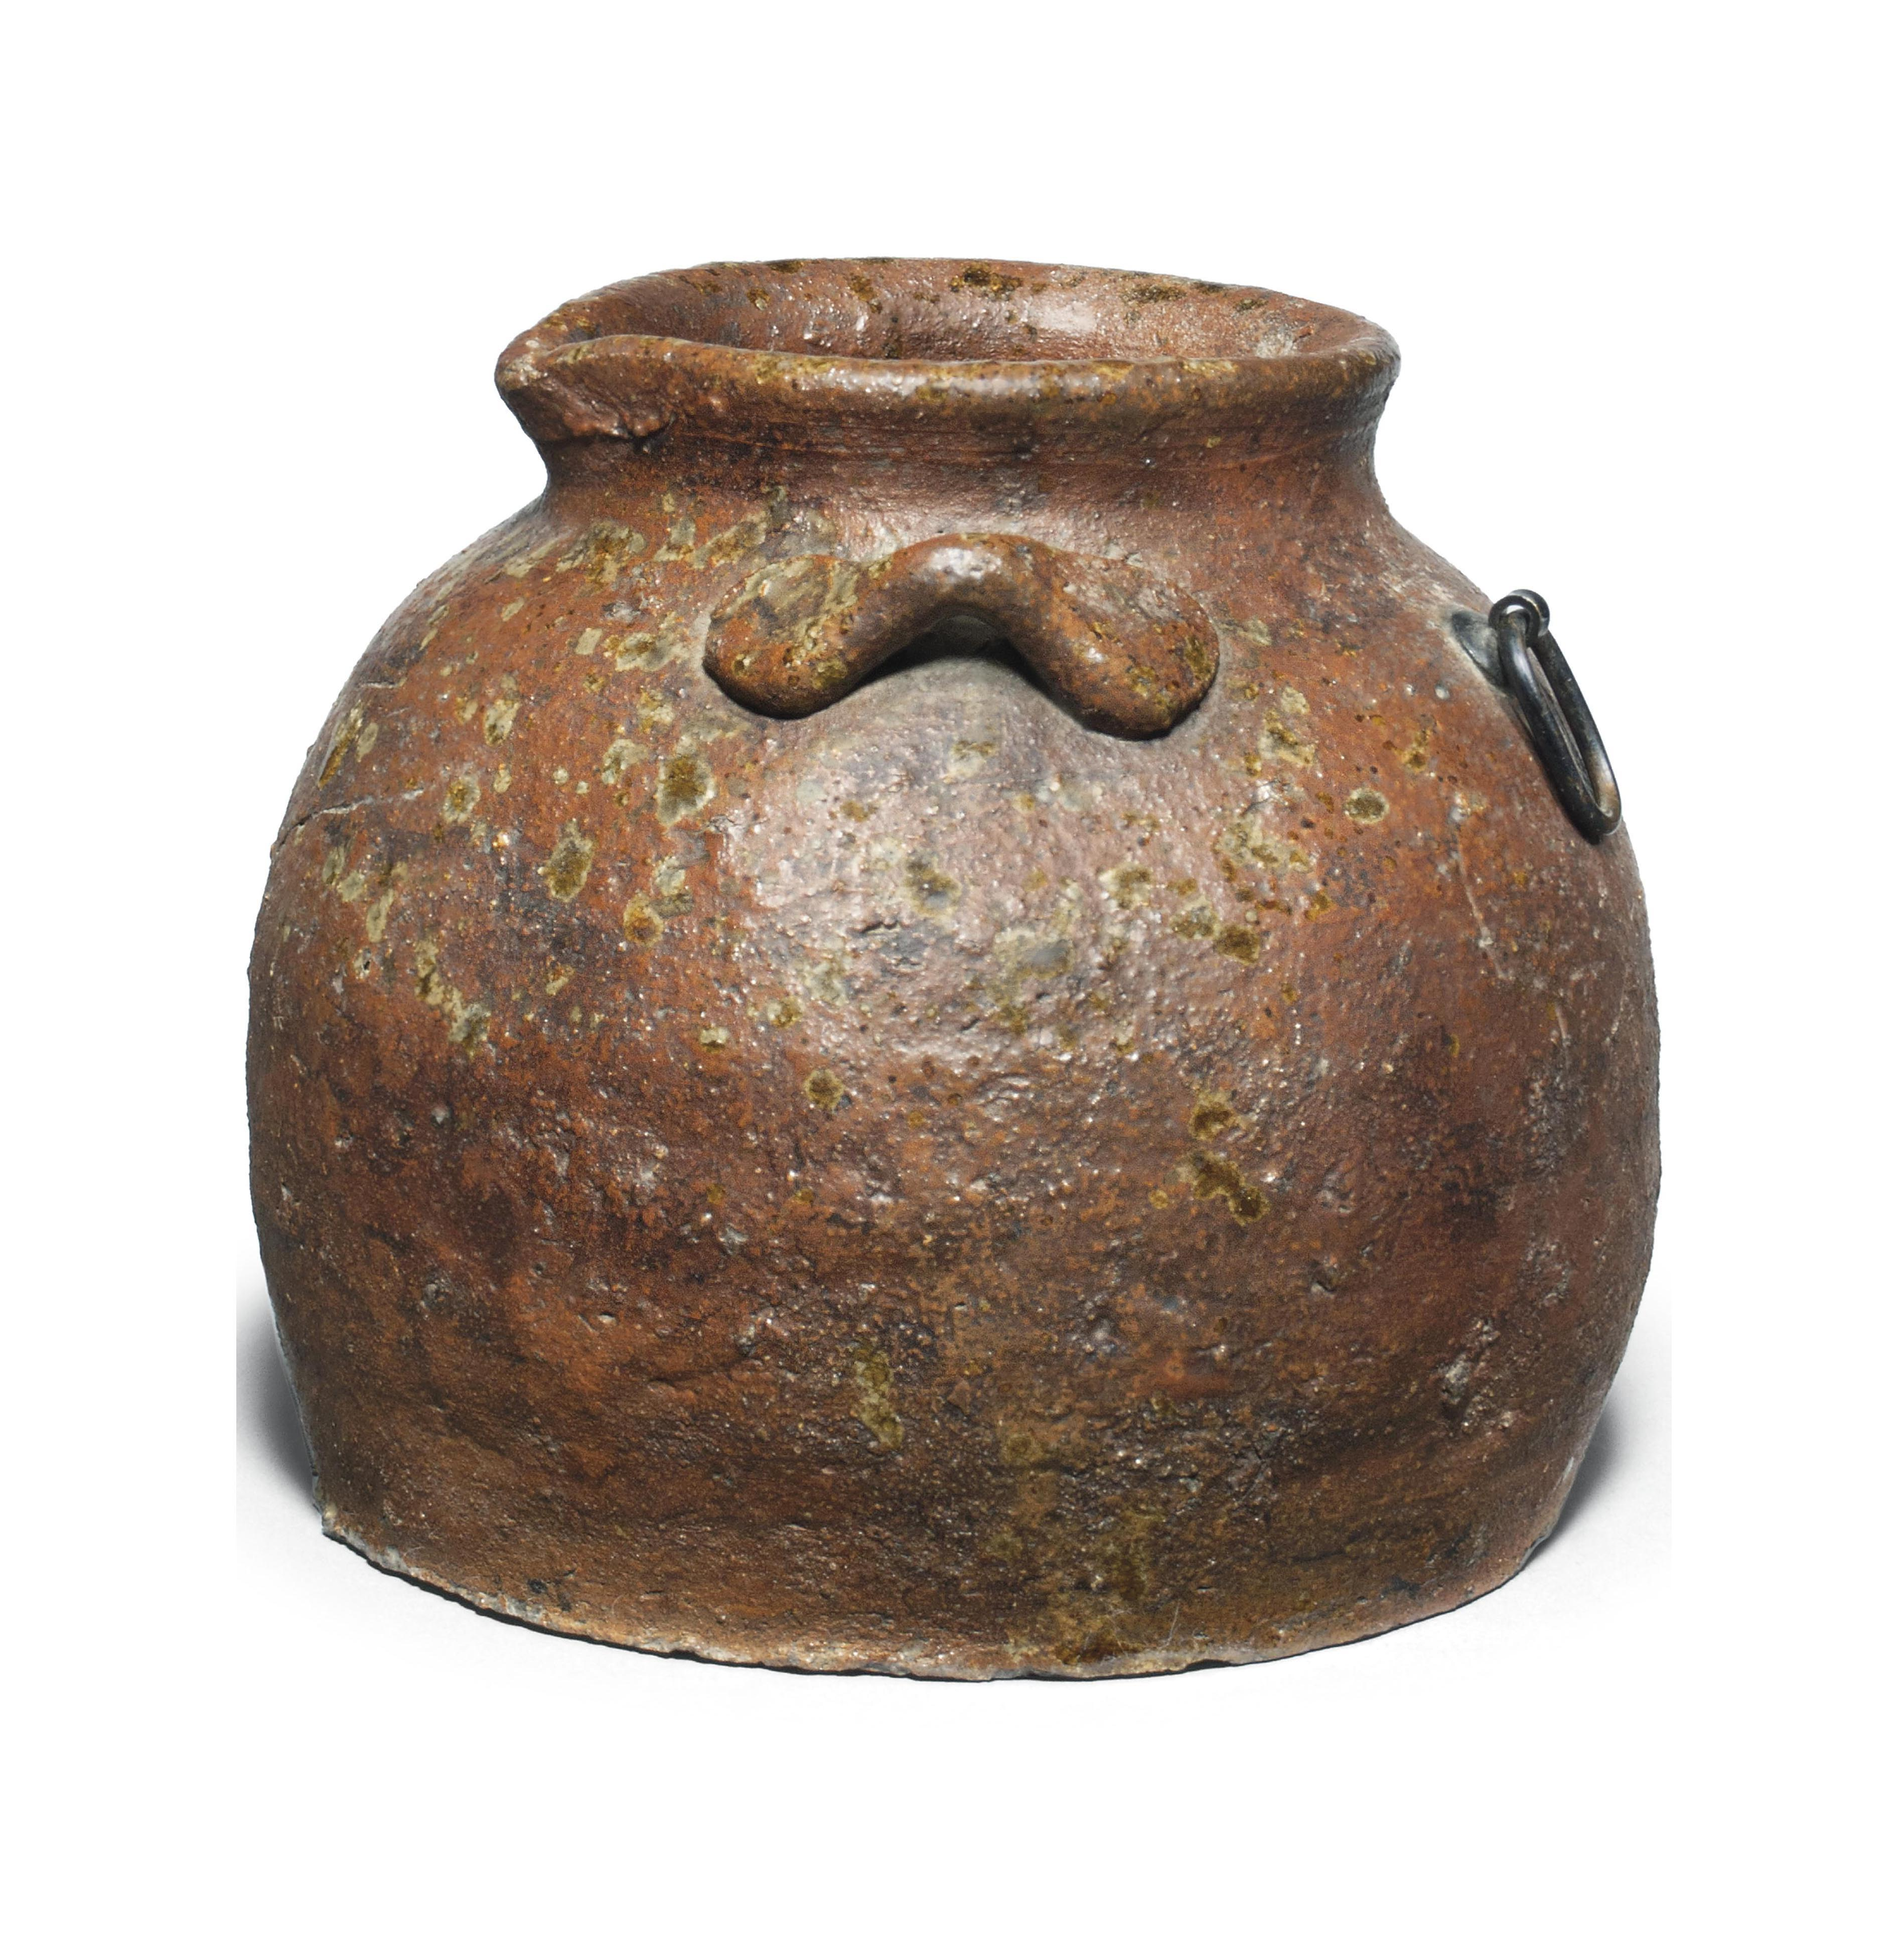 An Echizan Vase